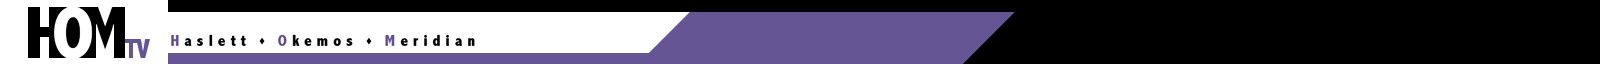 HOMTV logo